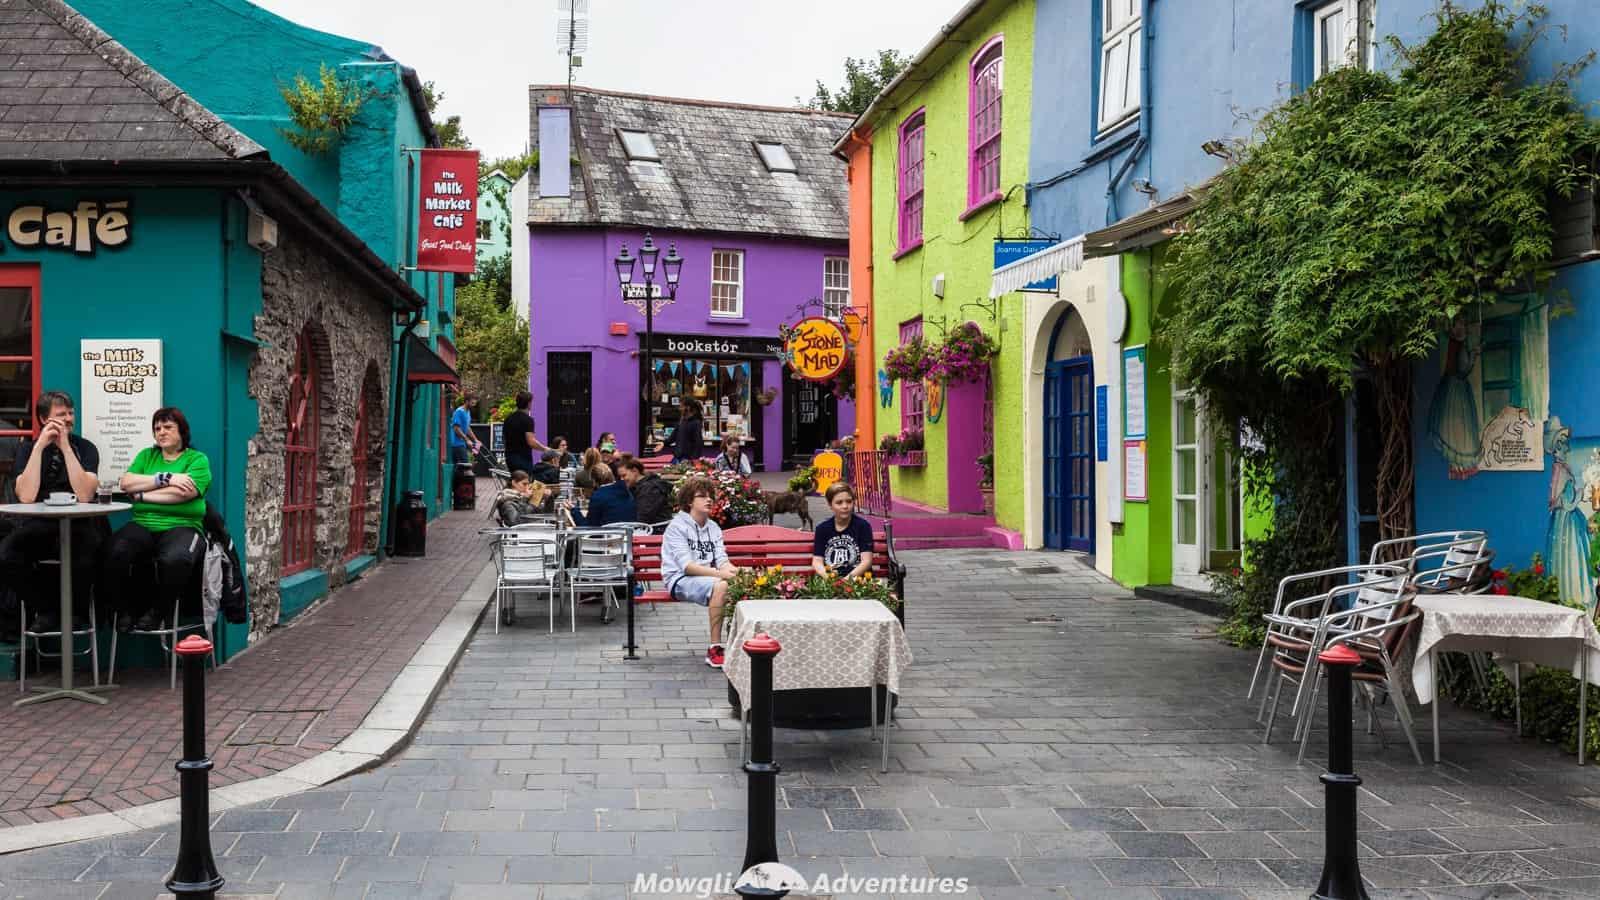 15 incredible things to do in Cork, Ireland | Wild Atlantic Way